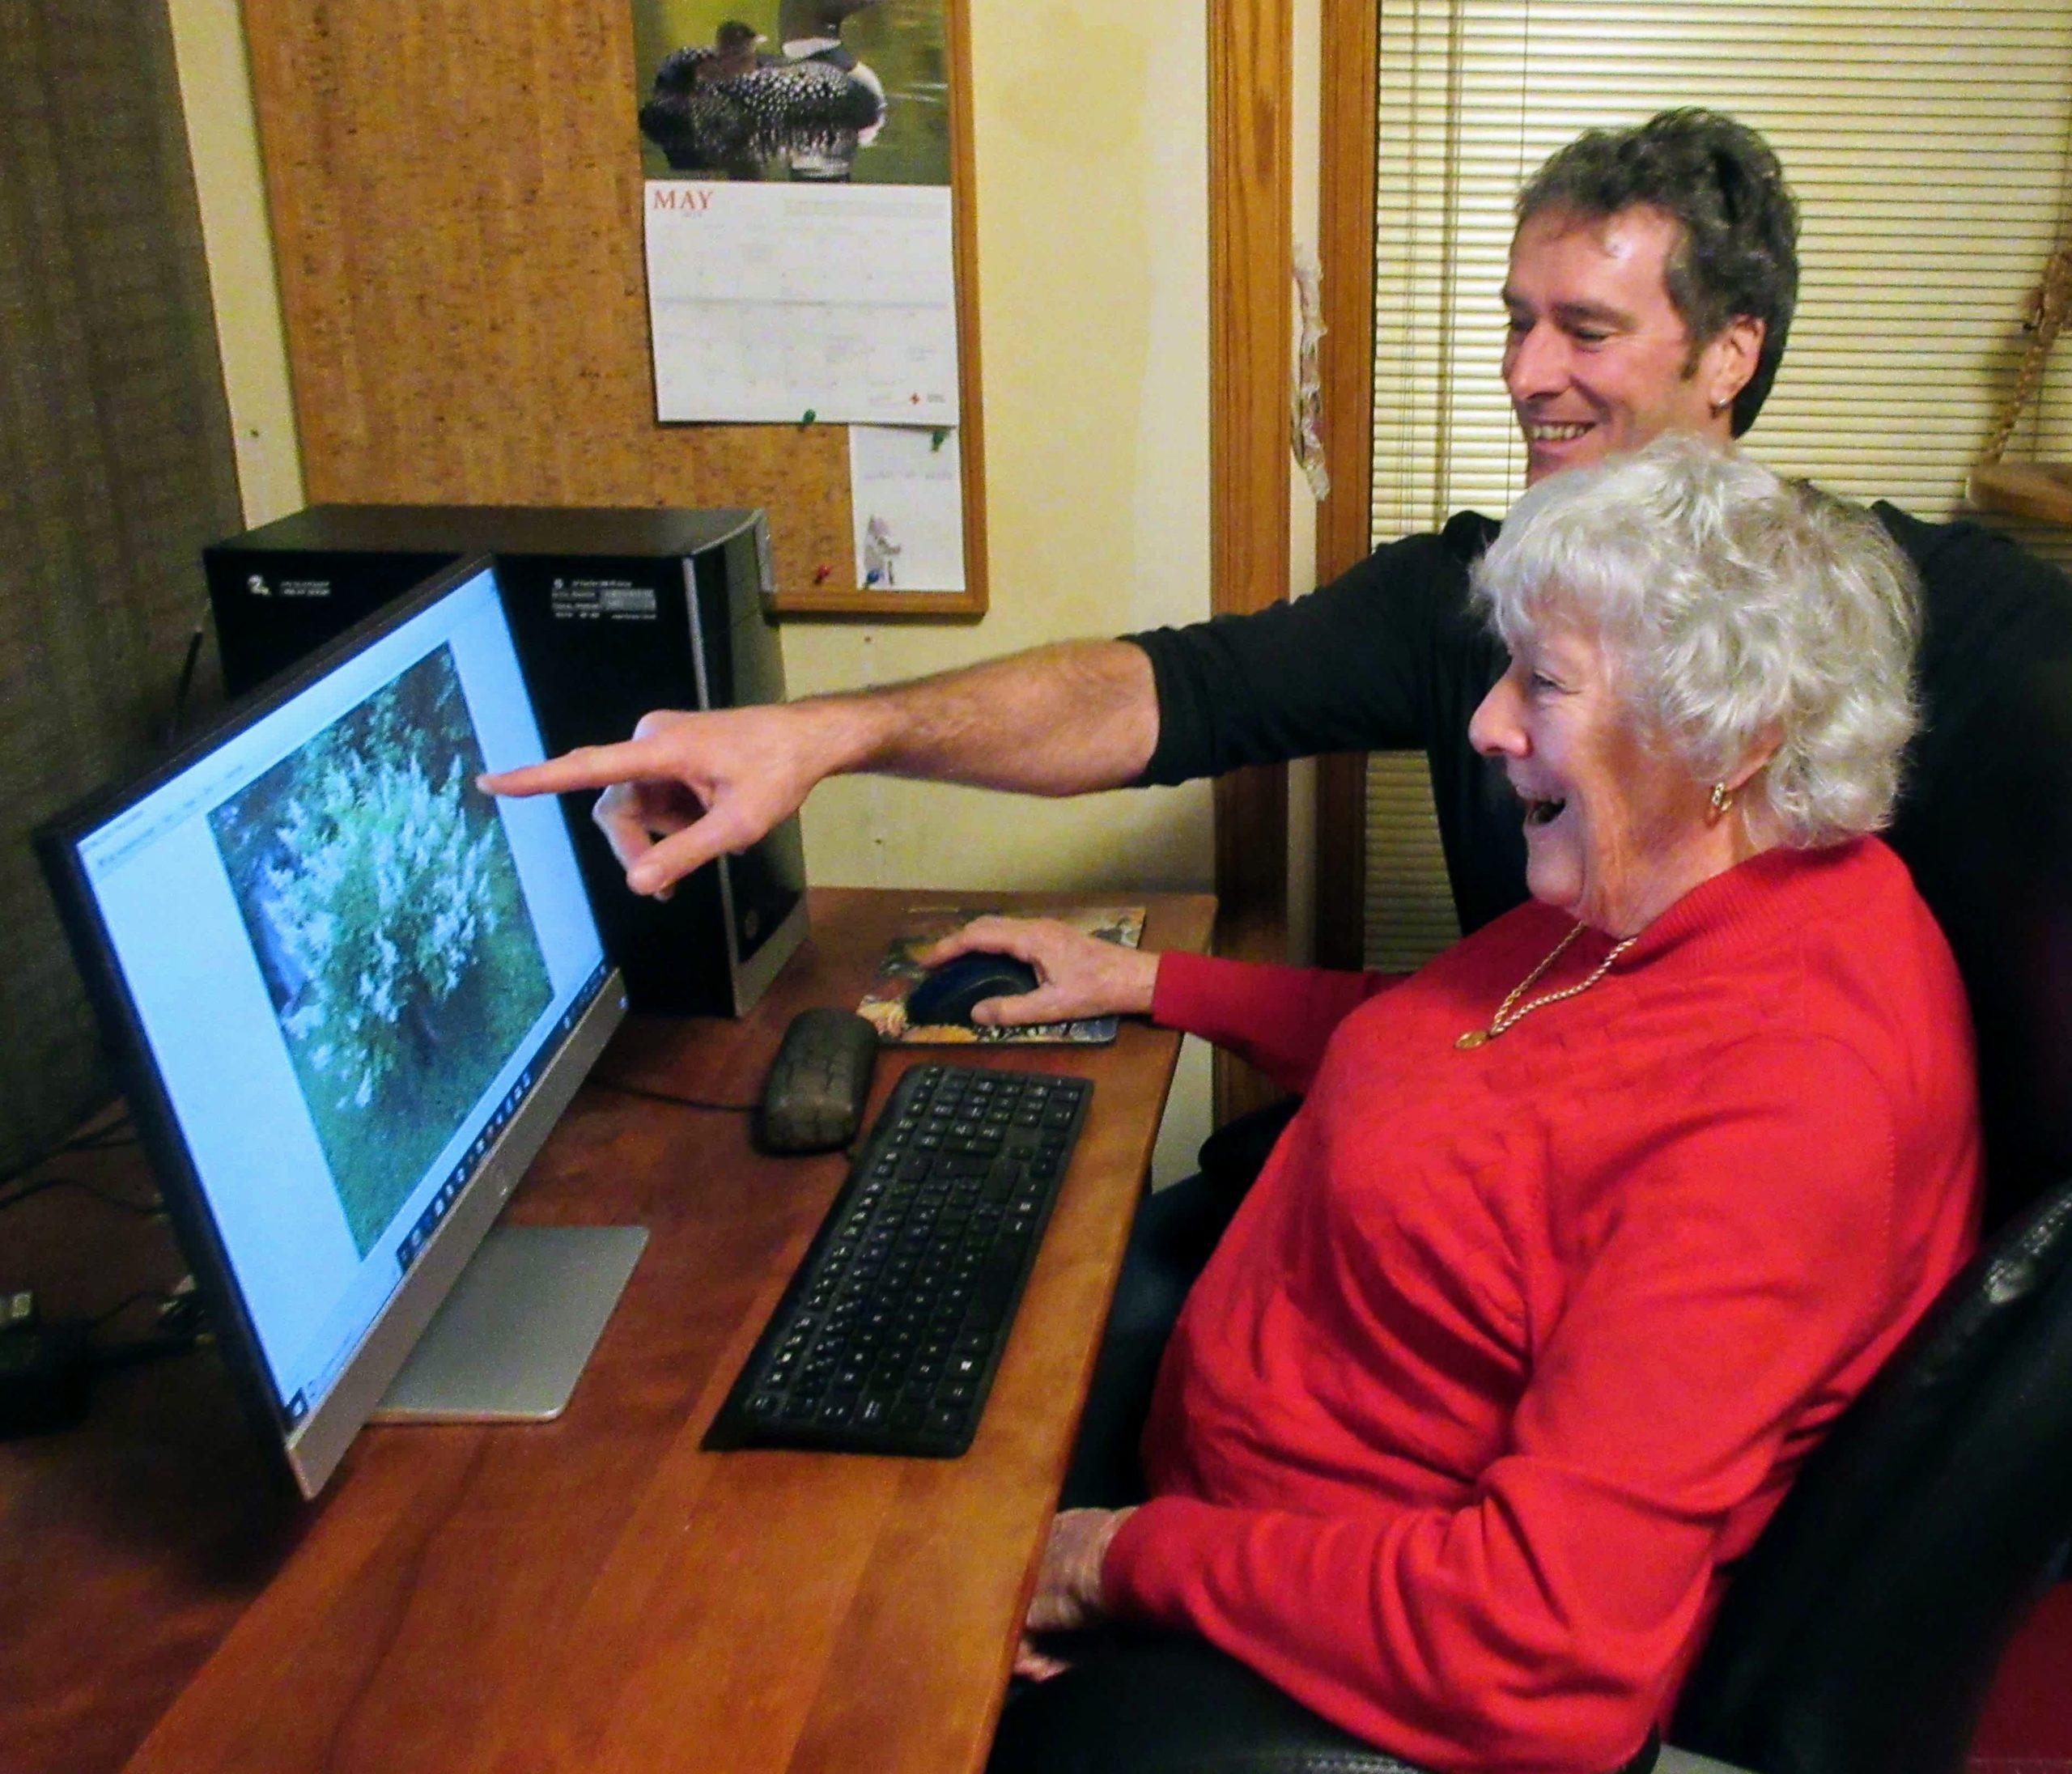 A man teaches an older woman how to use a desktop computer